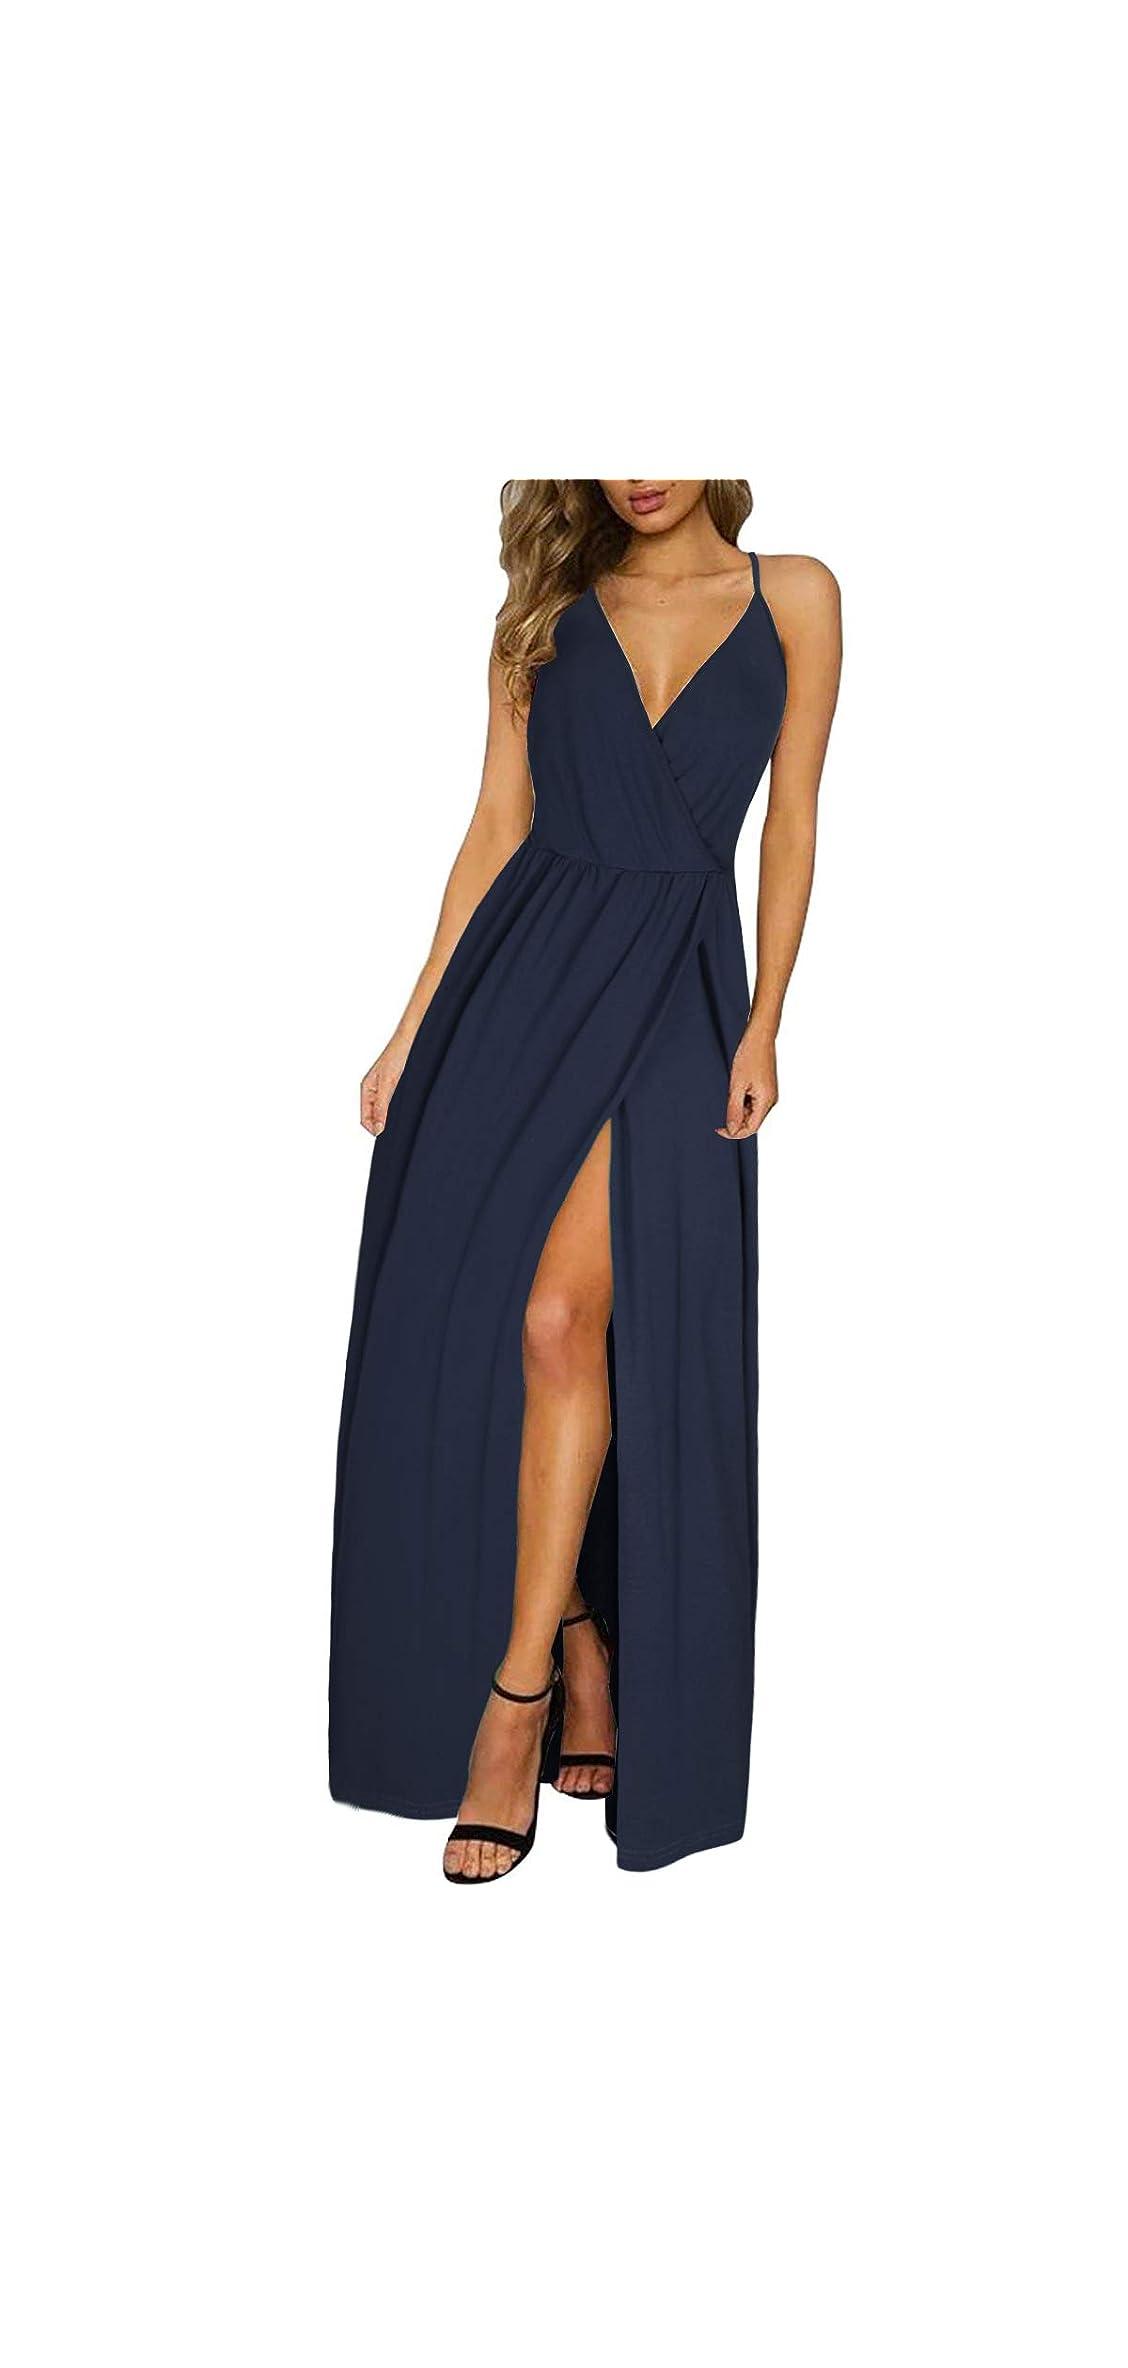 Women's Deep V-neck Casual Dress Summer Backless Floral